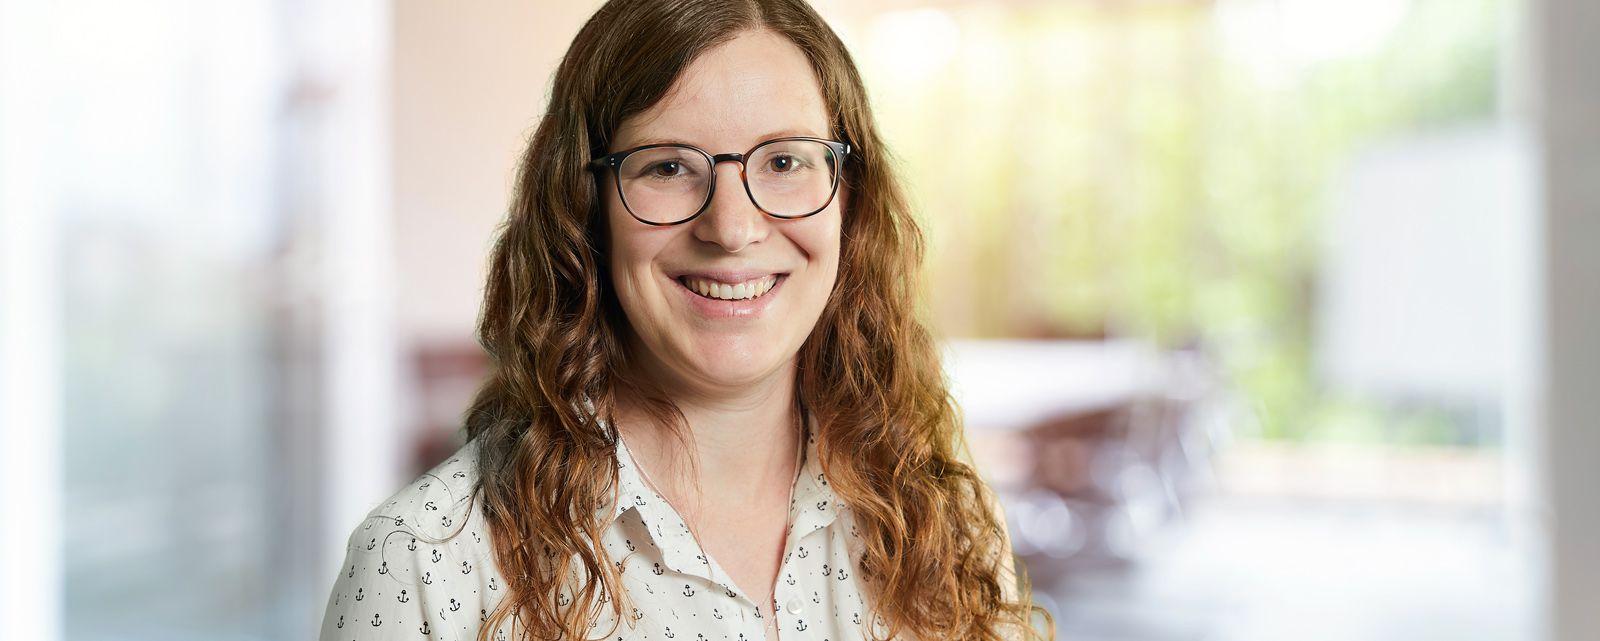 Michaela Metzinger (Foto: Michael Schafranek)